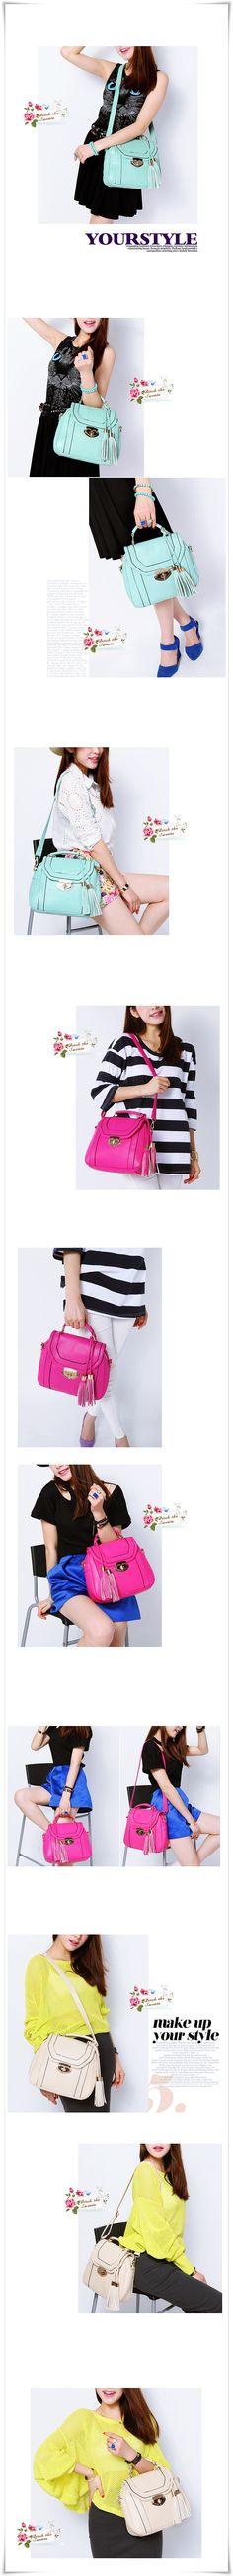 Designer Inspired 2013 Spring Handbag w/ Tassel. Also Wear as Shoulder or Messenger Bag. Available in Mint, Hot Pink, Creme. Only $38 & Free Shipping! #fashion